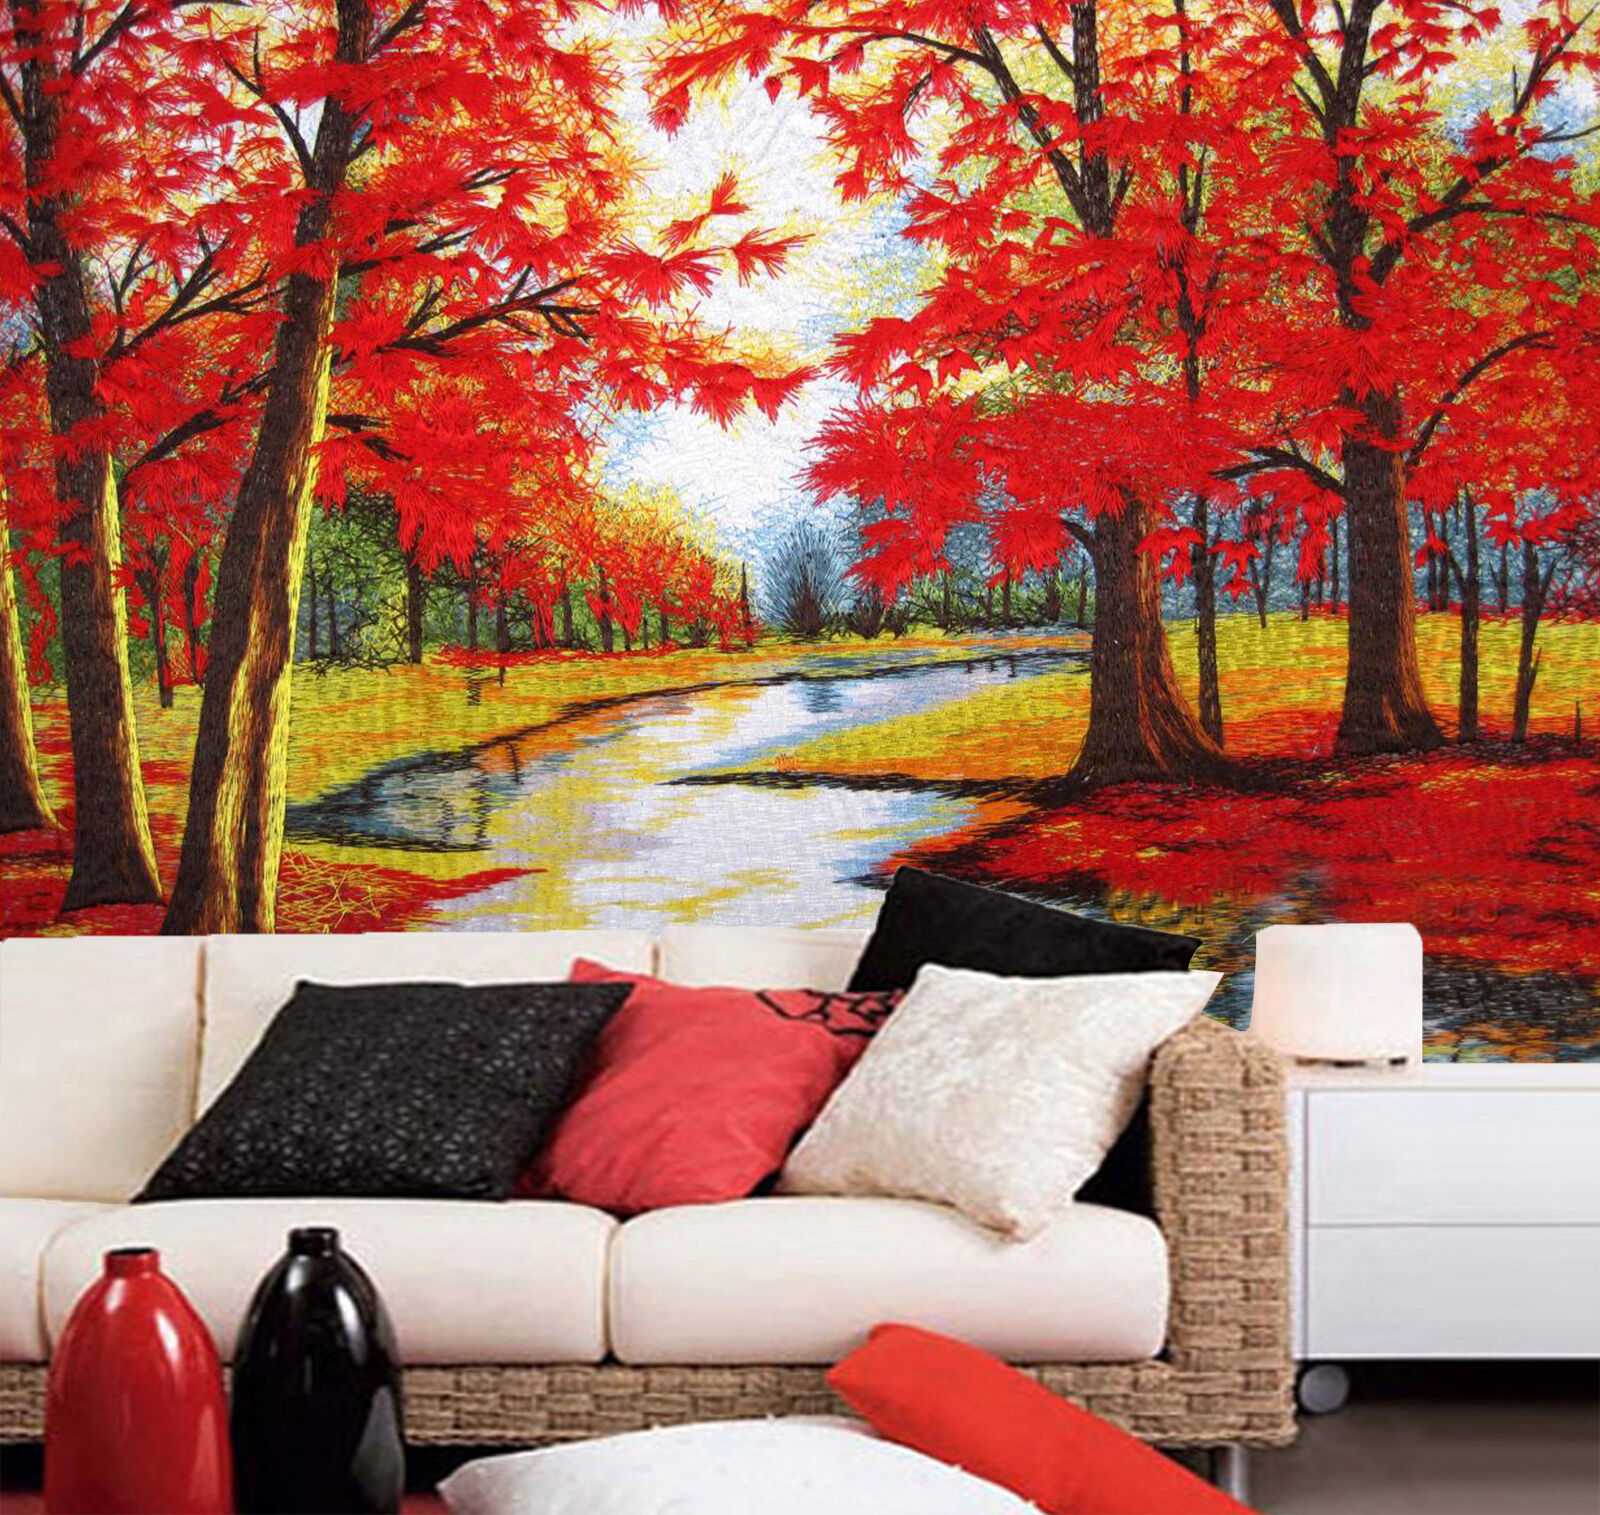 3D Fluss und Bäume 85 Fototapeten Wandbild Fototapete Bild Tapete Familie Kinder